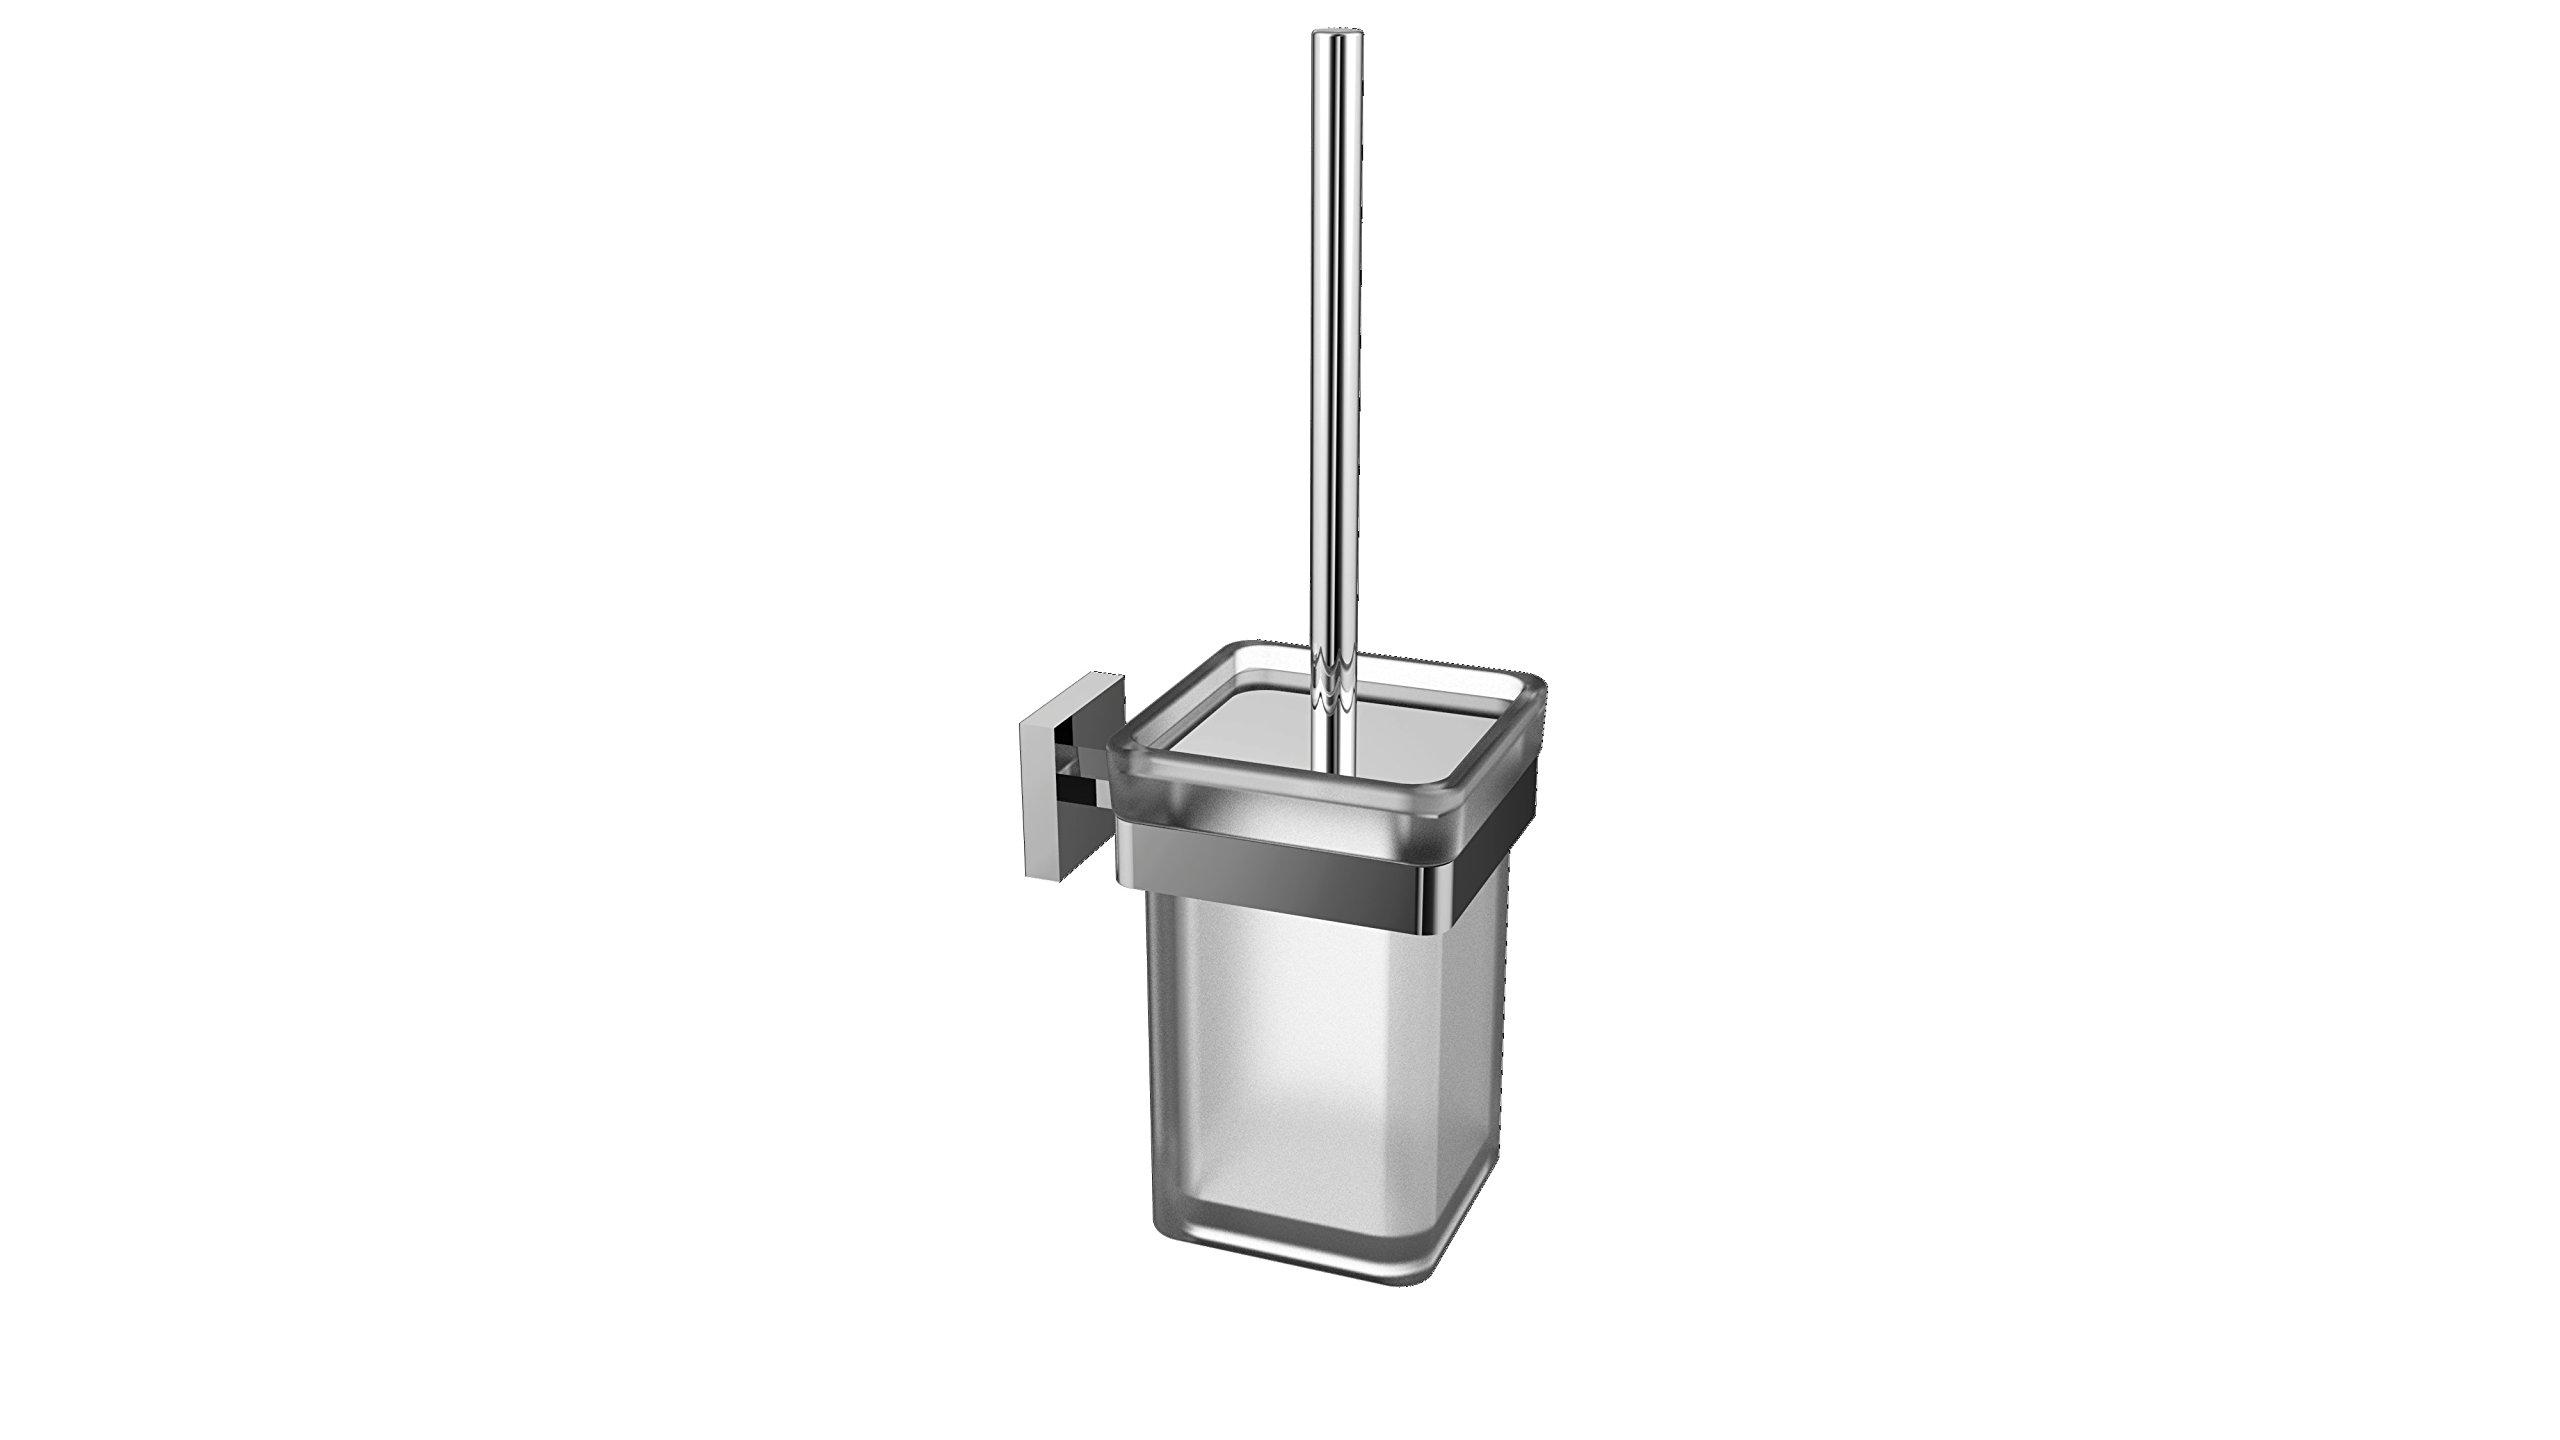 Eviva EVAC90CH Cleansi Toilet Brush Bathroom Accessories Combination, Chrome by Eviva